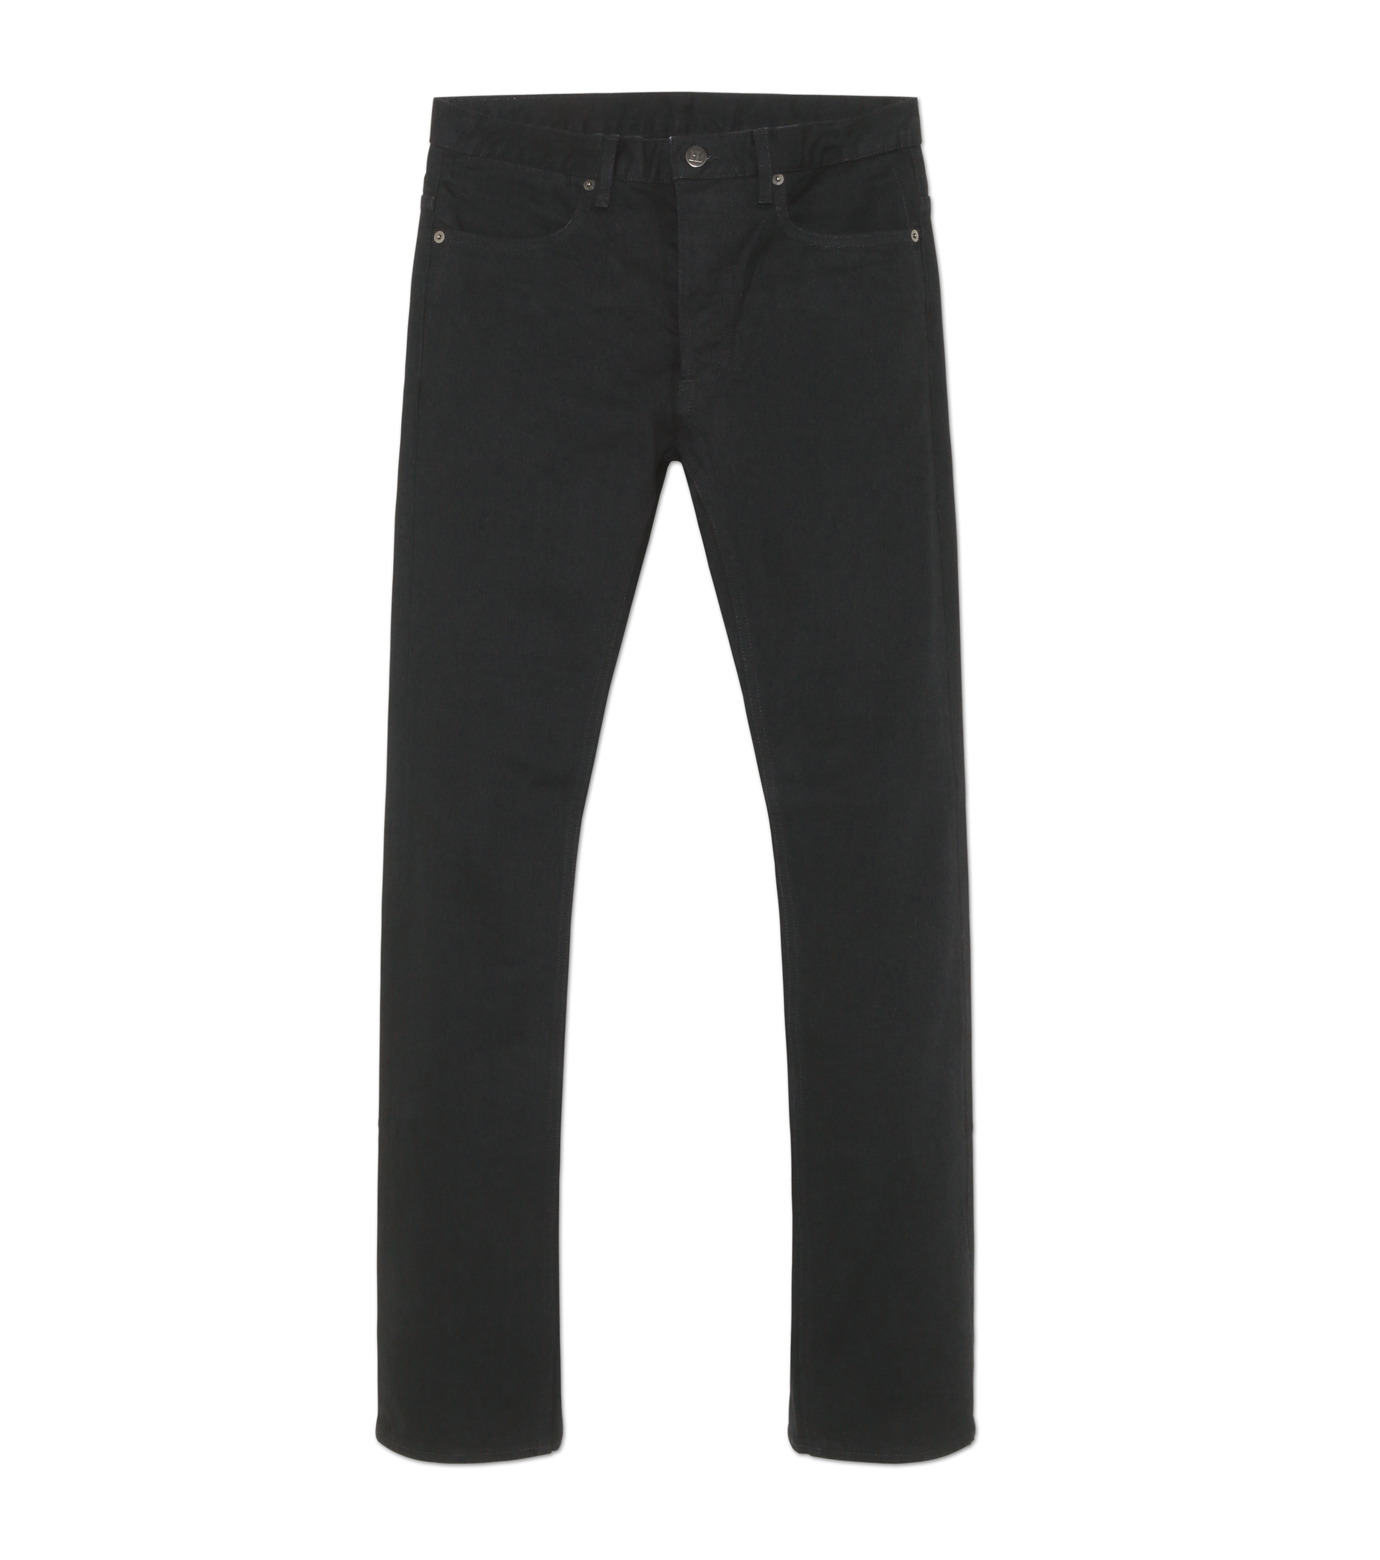 HL HEDDIE LOVU(エイチエル・エディールーヴ)のHL SLIM-BLACK(パンツ/pants)-18S98009-13 拡大詳細画像1